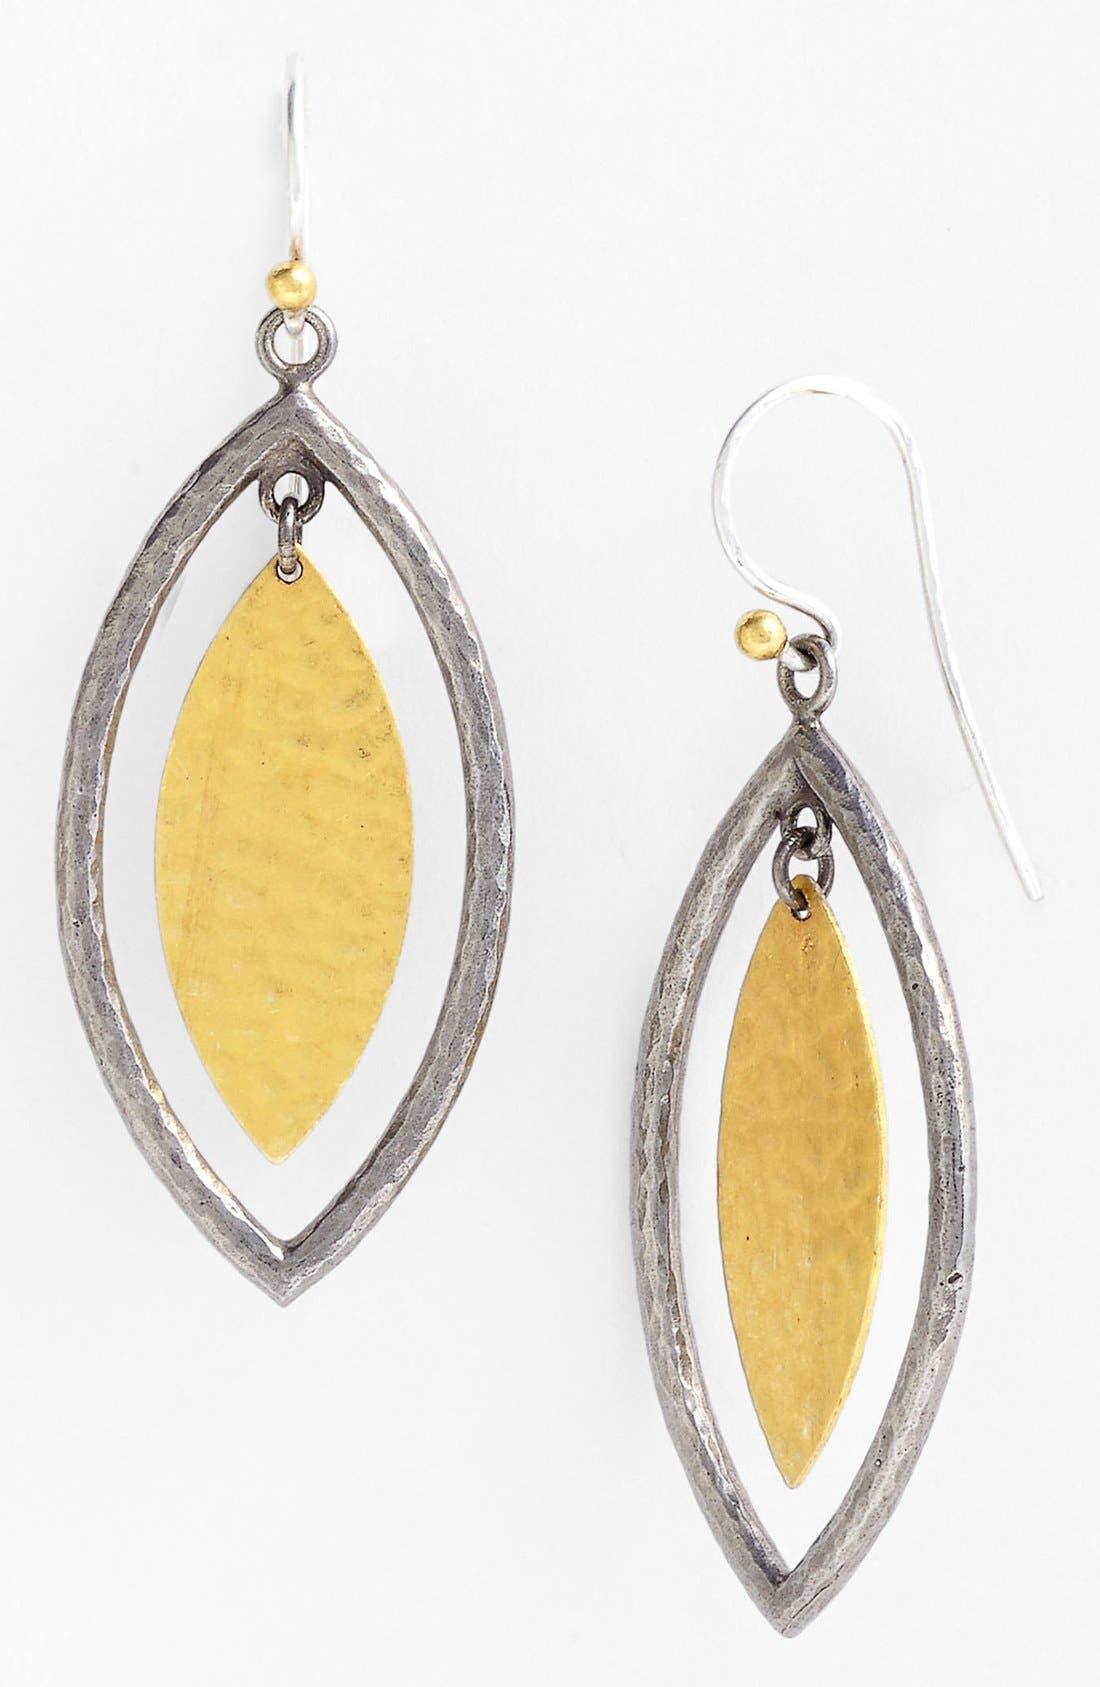 Alternate Image 1 Selected - Gurhan 'Willow' Blackened Silver & Gold Earrings